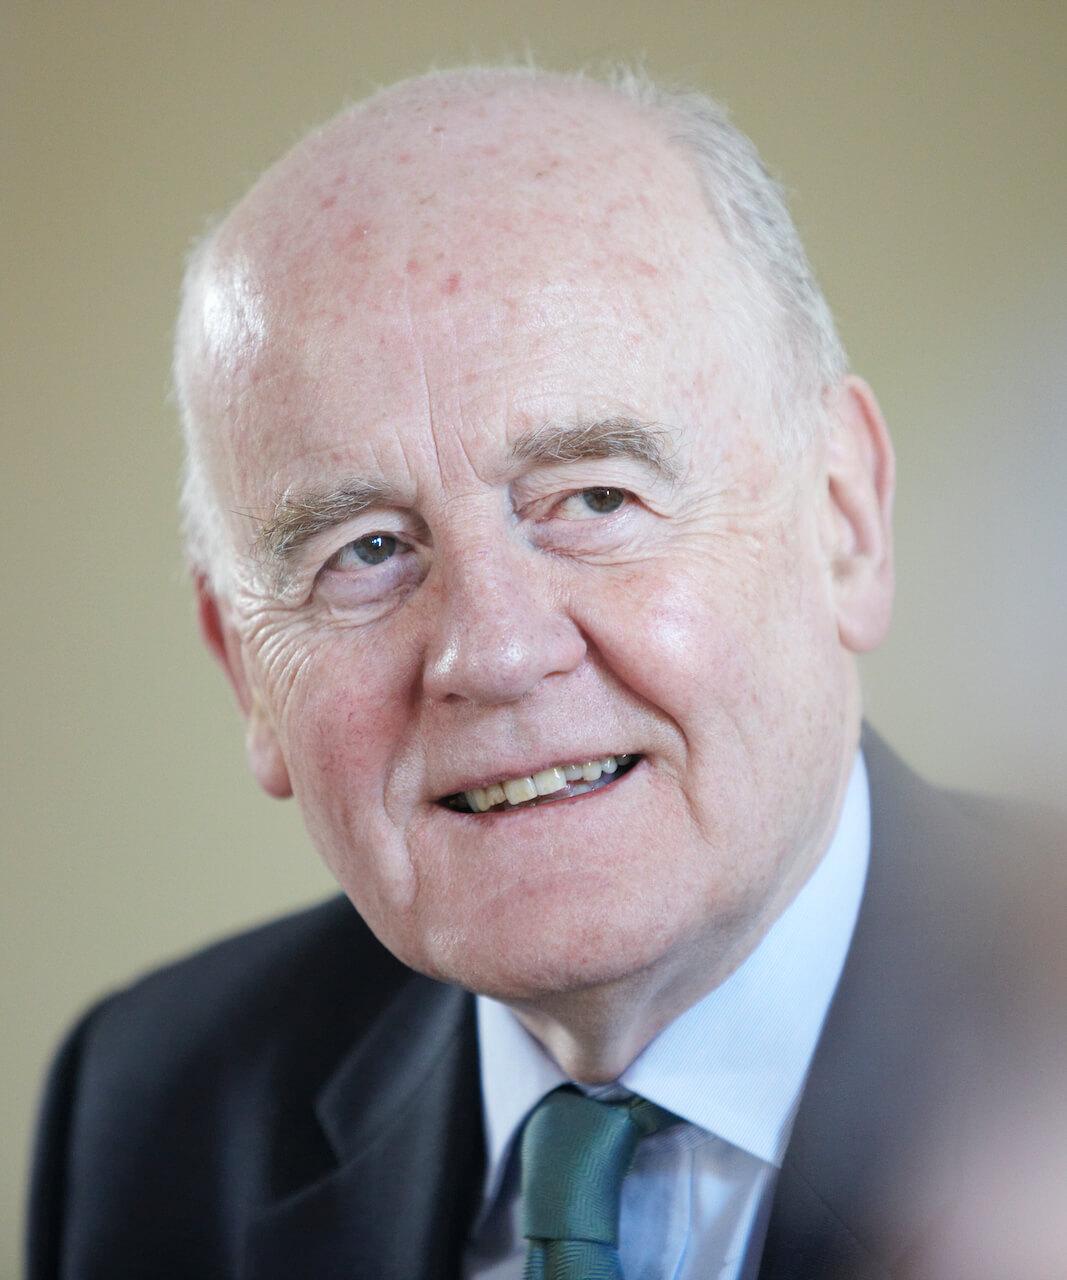 Robert Black CBE, Scotland's first Auditor General